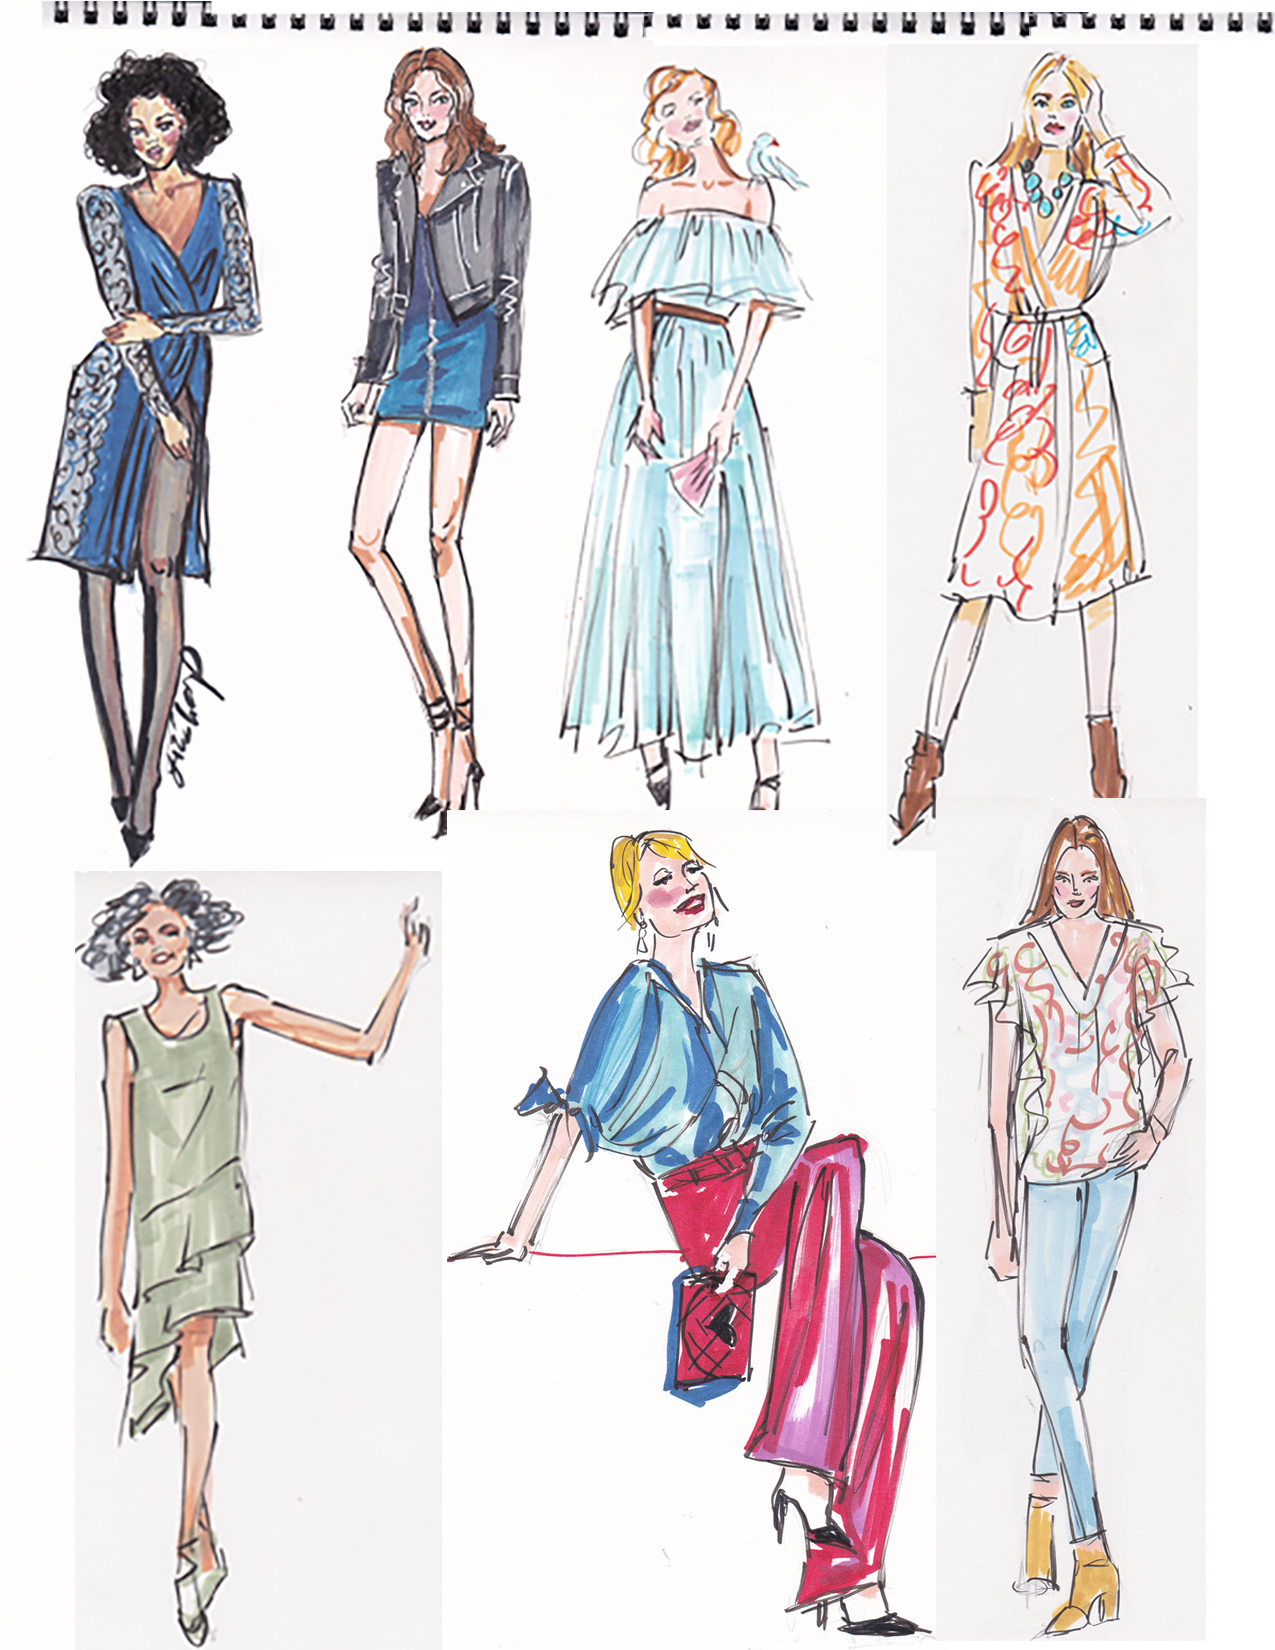 daily 5 min. fashion sketches